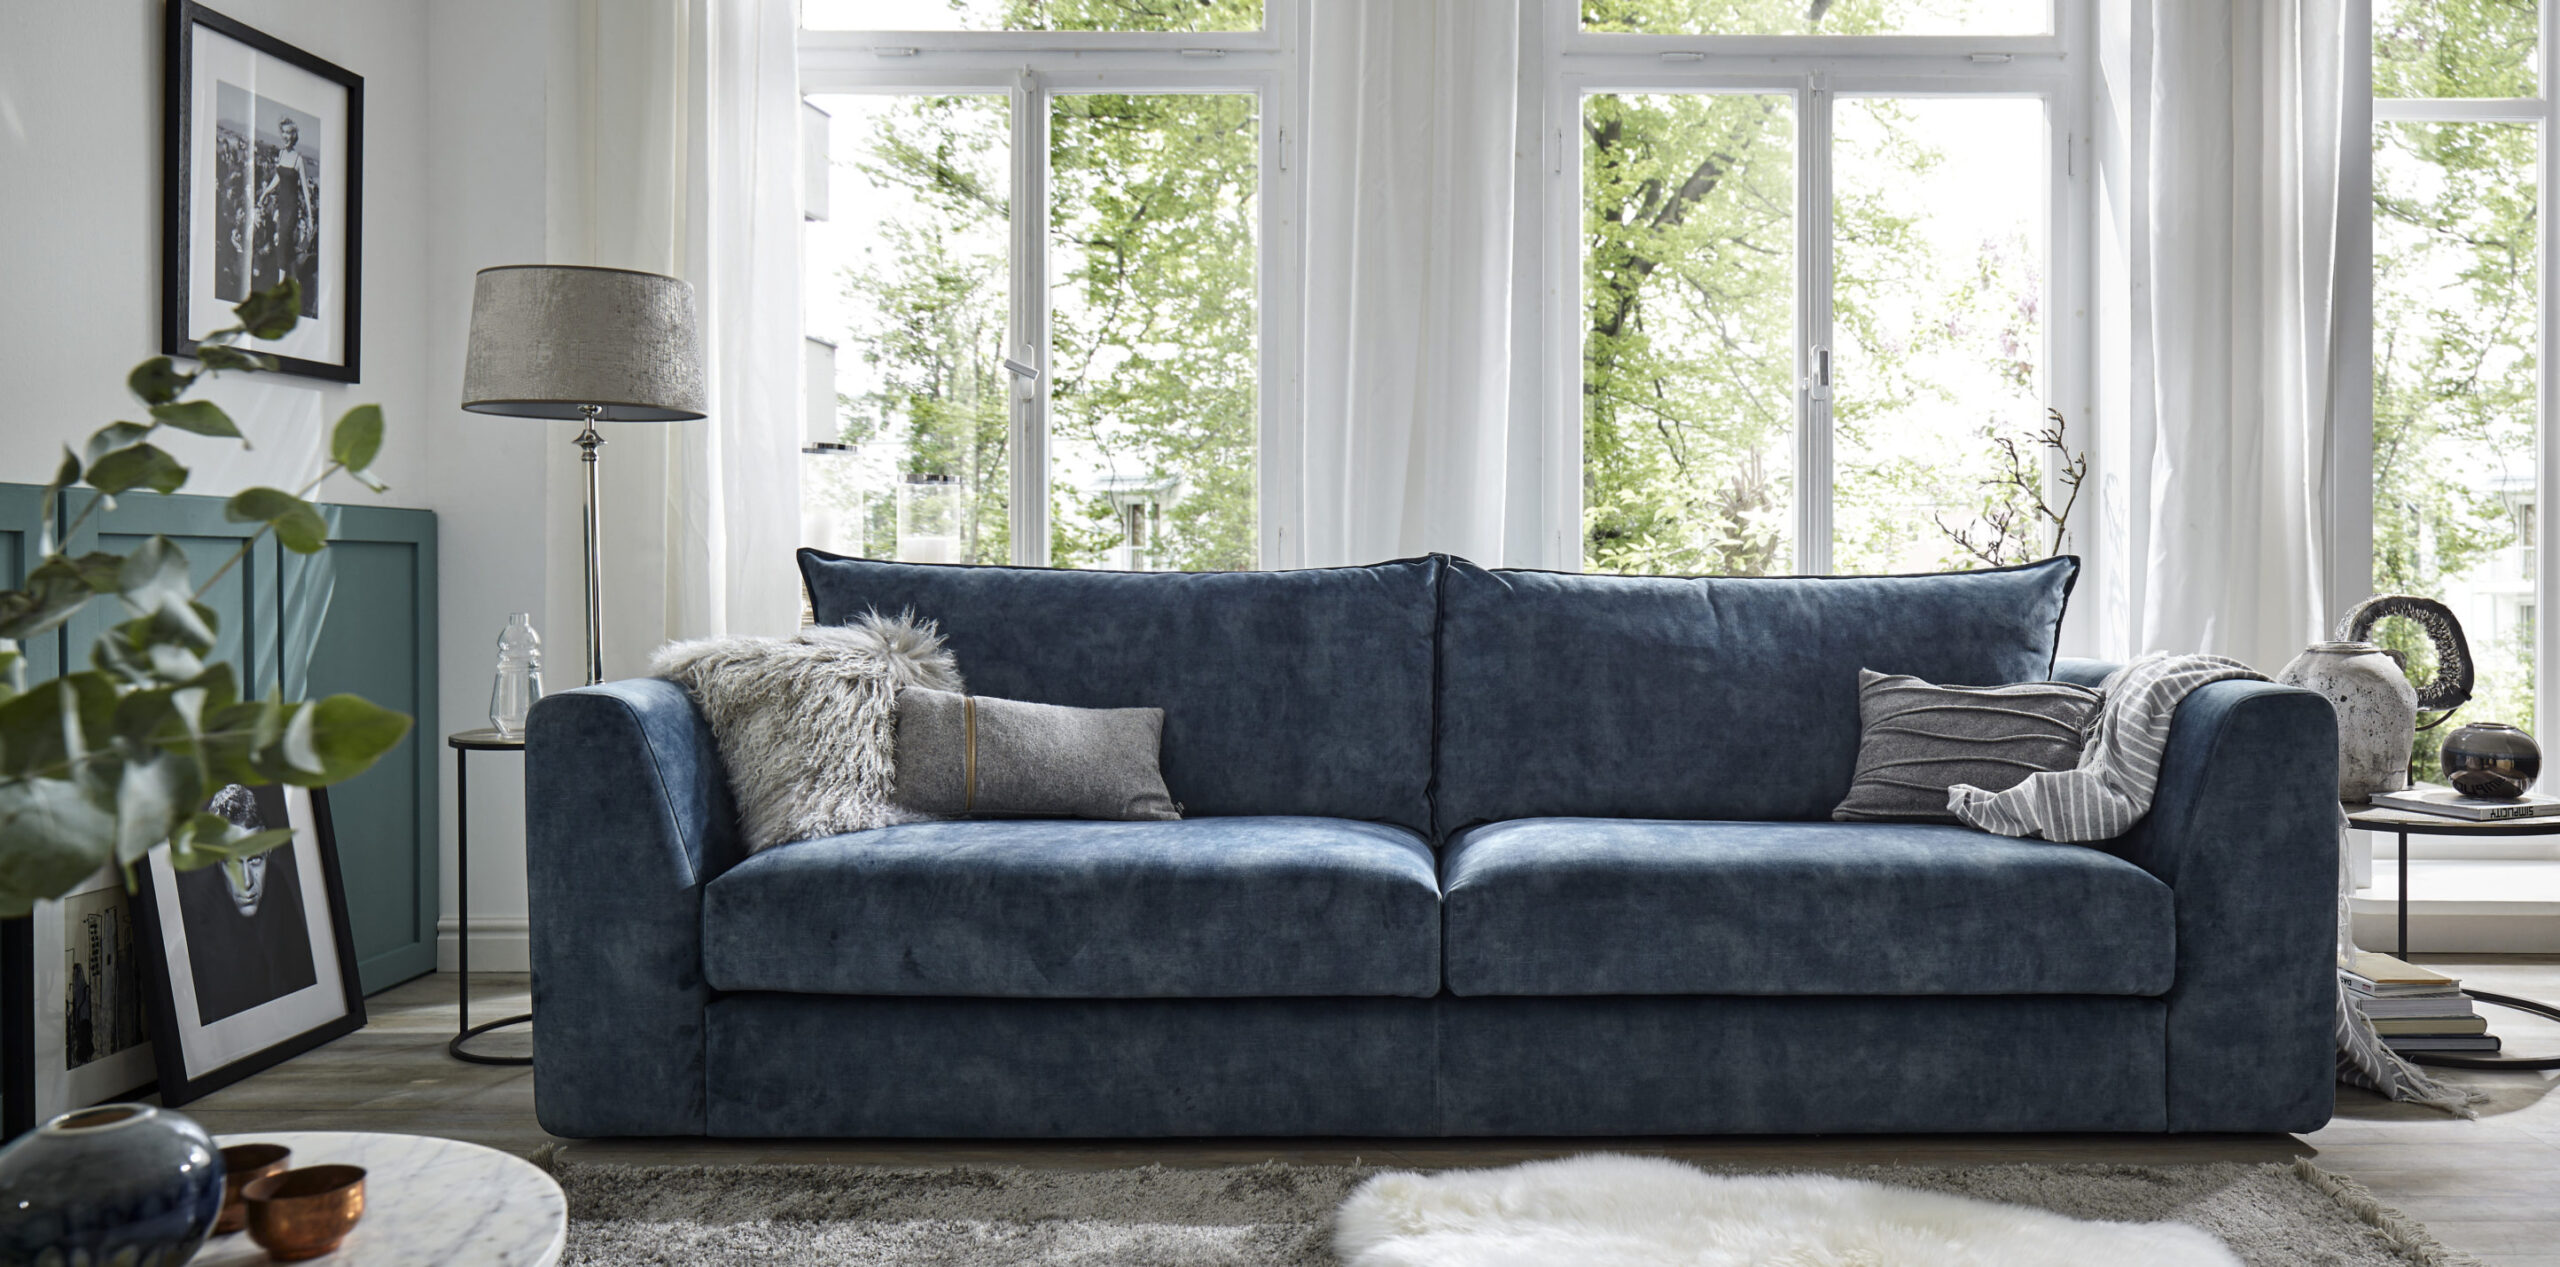 Full Size of Natura Sofa Couch Newport Brooklyn Kaufen Love Denver Kansas Livingston Gebraucht Home Pasadena 3 Sitzer Hampstead In Blau Natrlich Wohnen Wessing Tom Tailor Sofa Natura Sofa